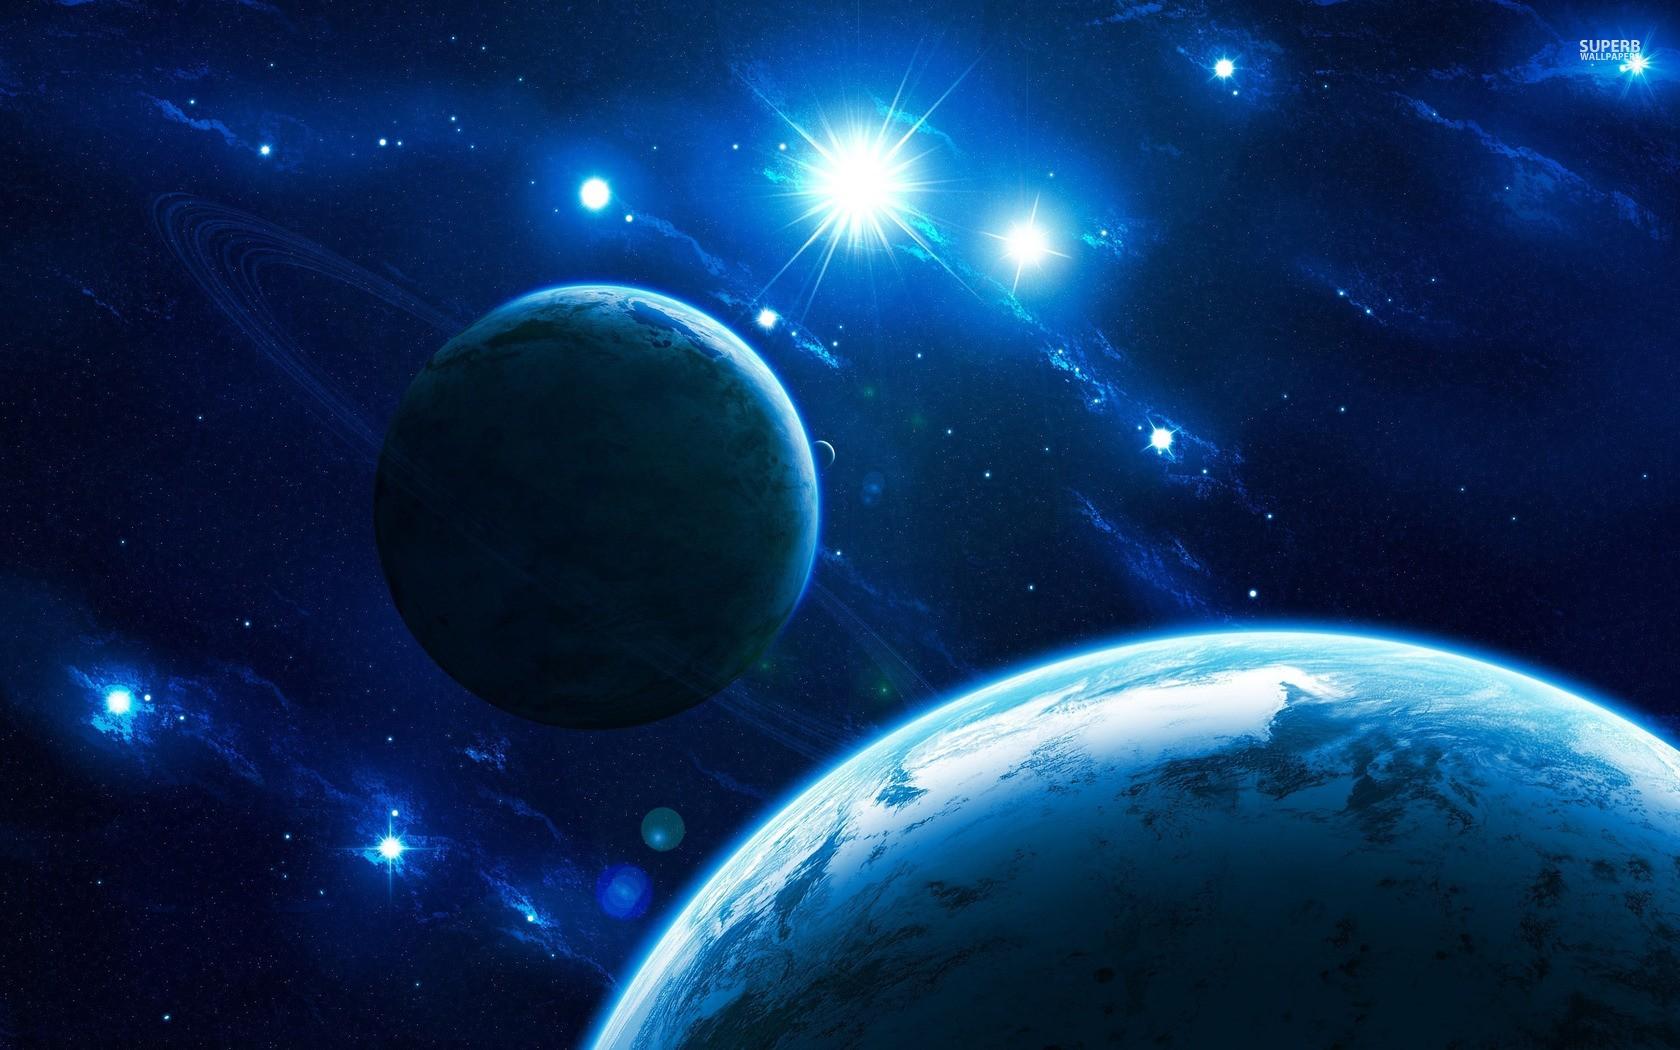 General 1680x1050 space space art planetary rings planet digital art